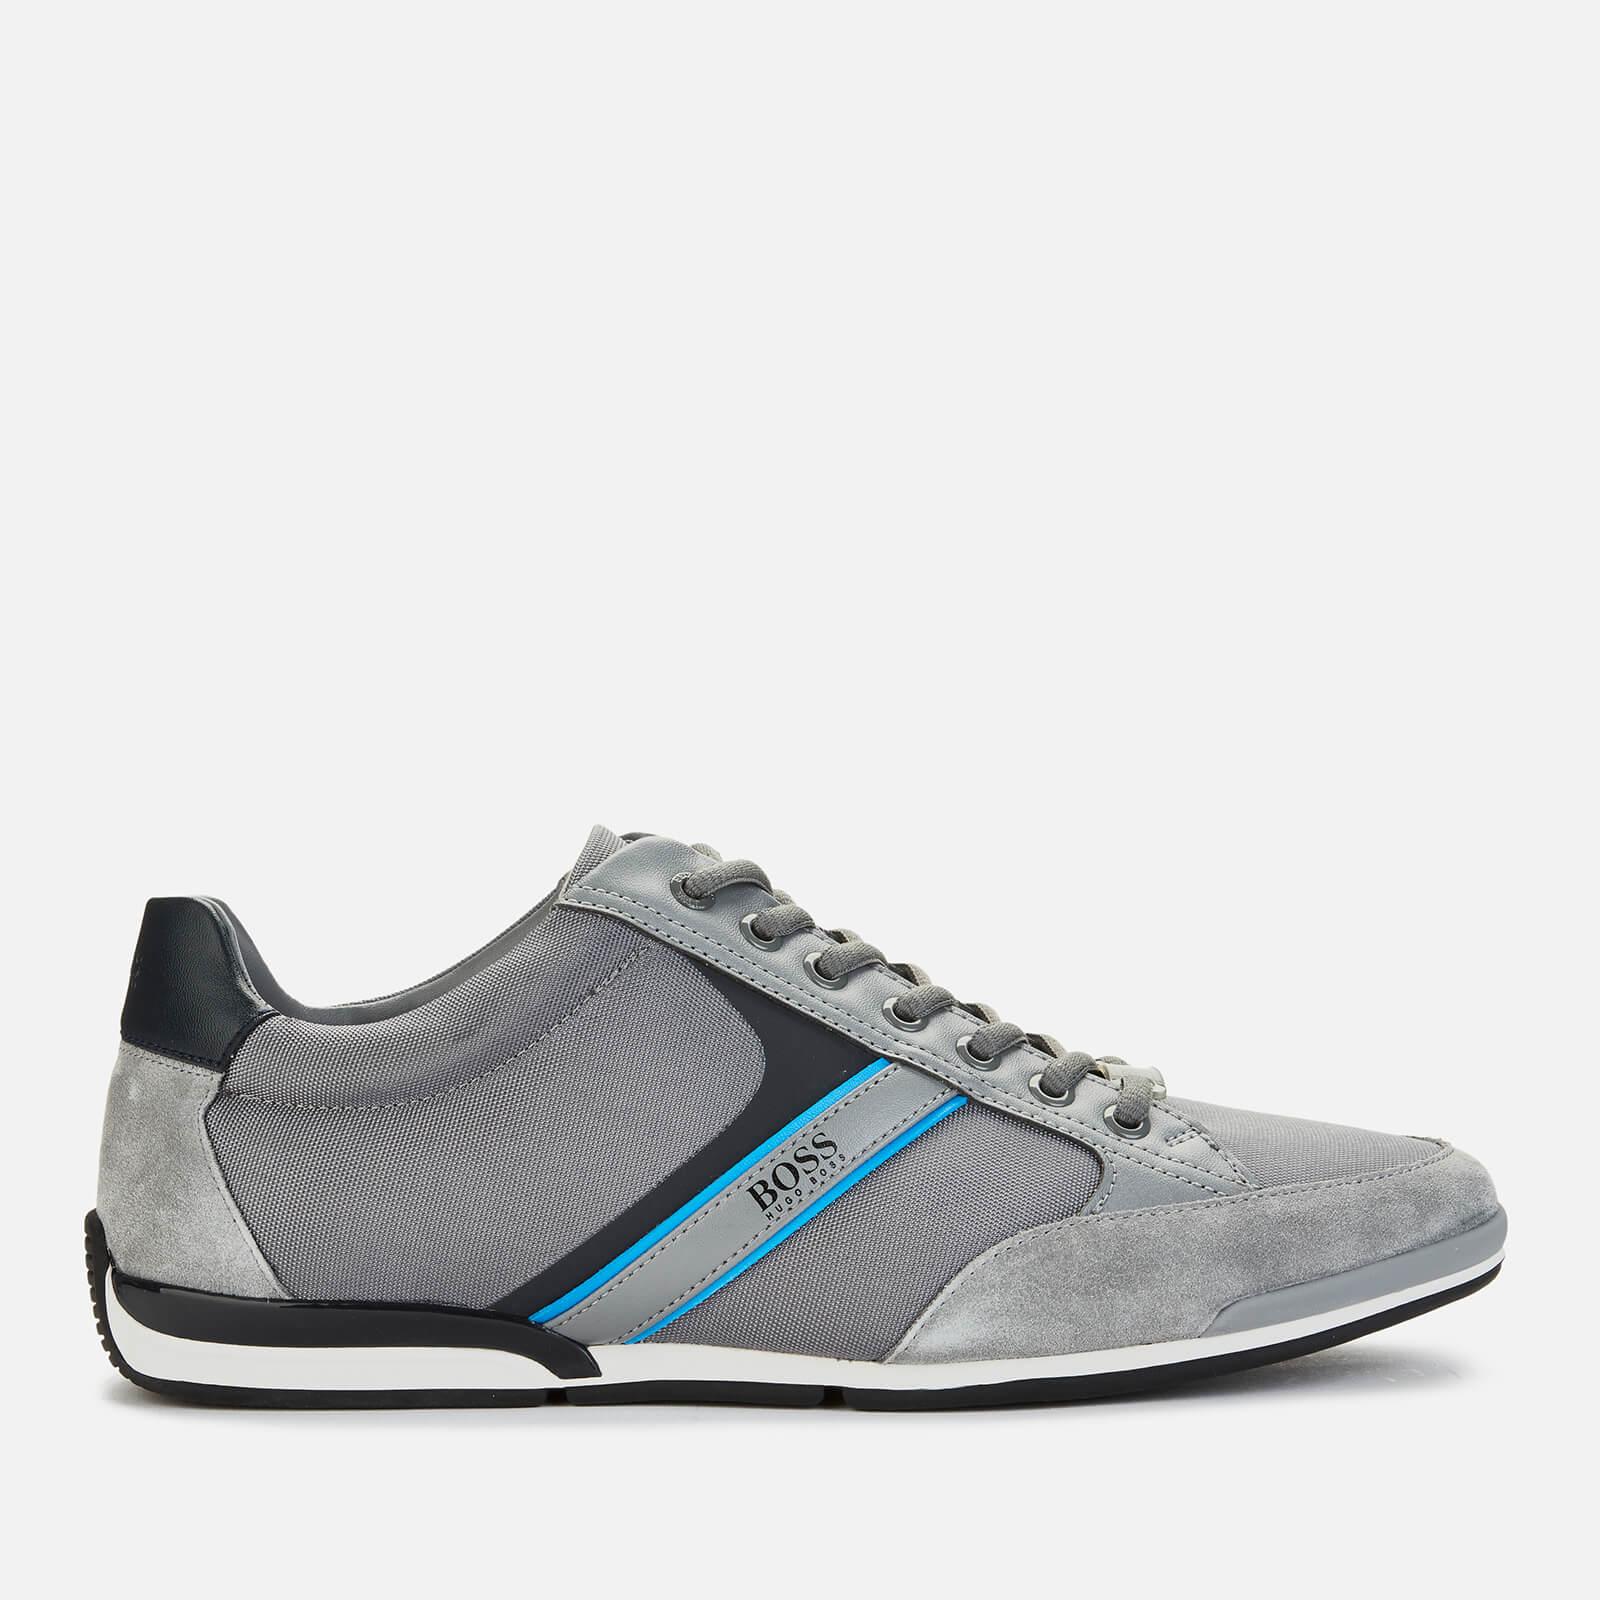 BOSS Athleisure Men's Saturn Low Trainers - Medium Grey - UK 9